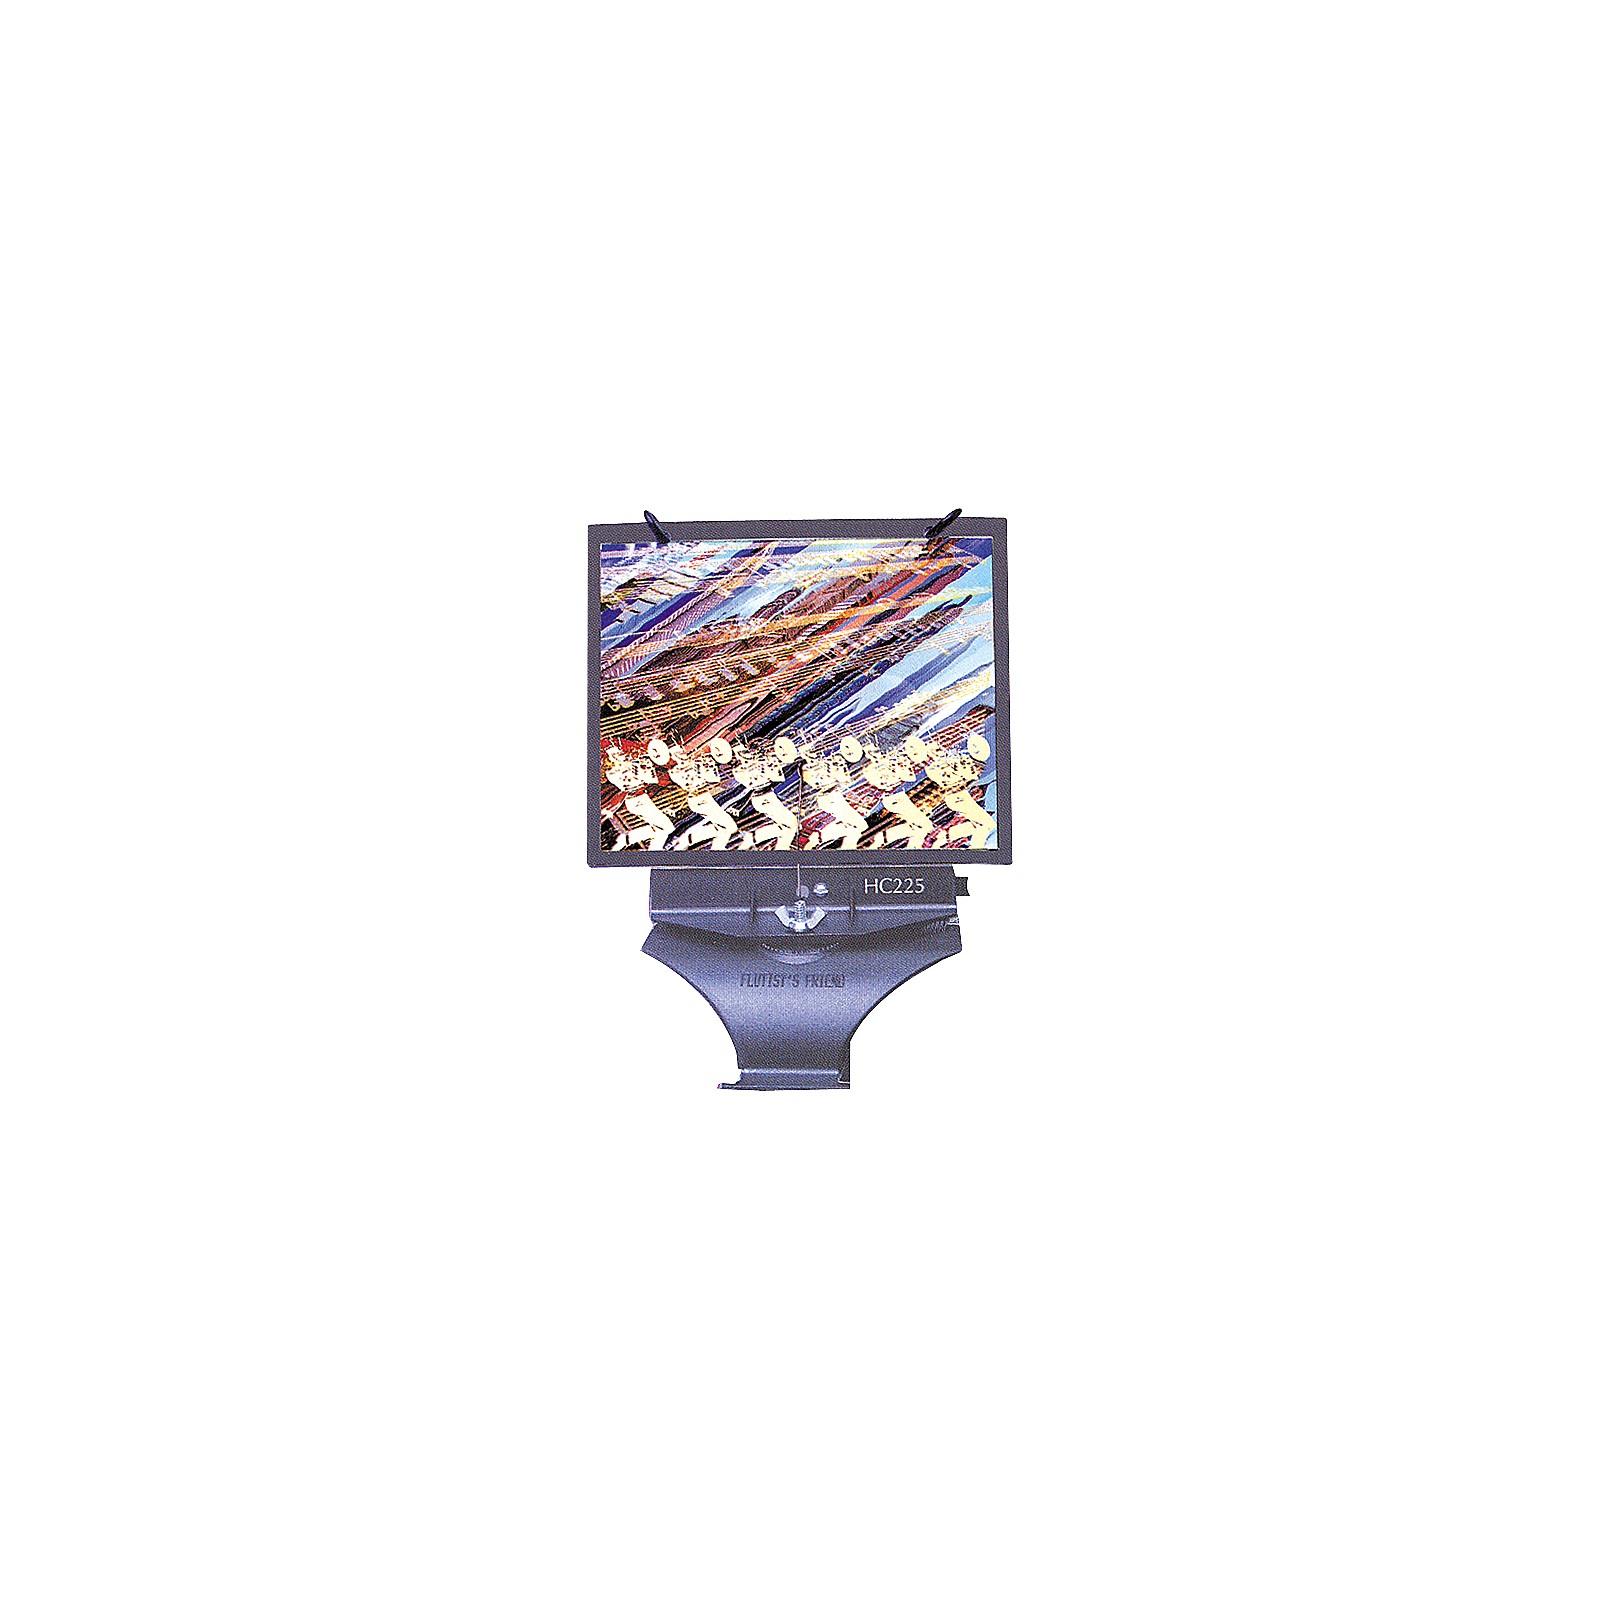 DEG A16-HC225 Flutist's Friend Flute/Piccolo Lyre